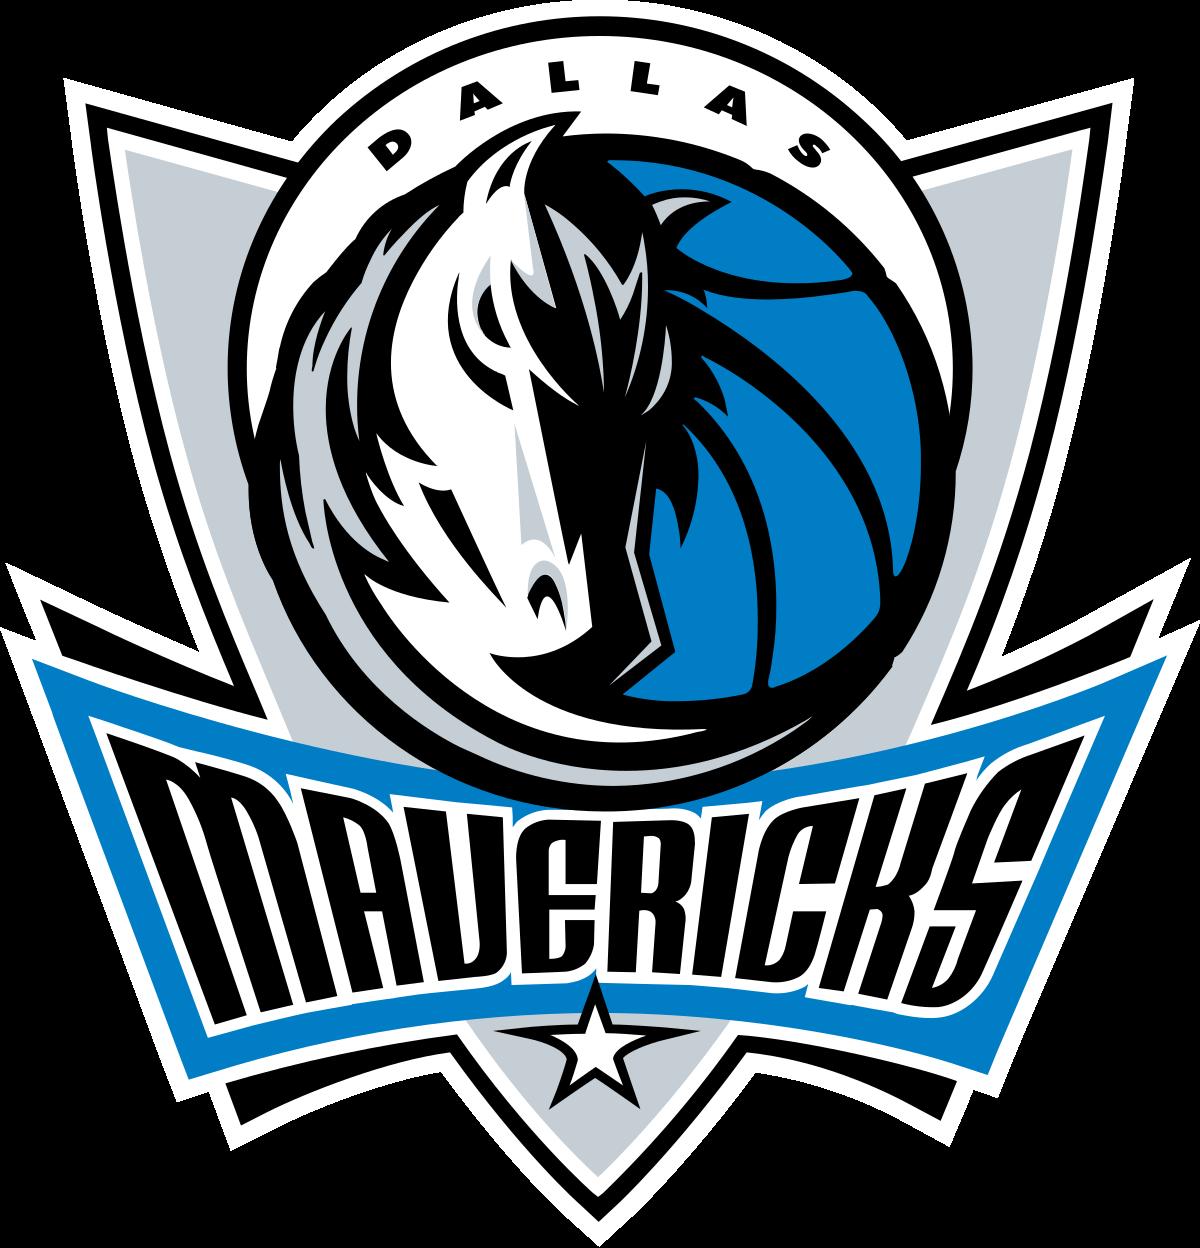 Dallas Mavericks donateds to MFP for COVID-19